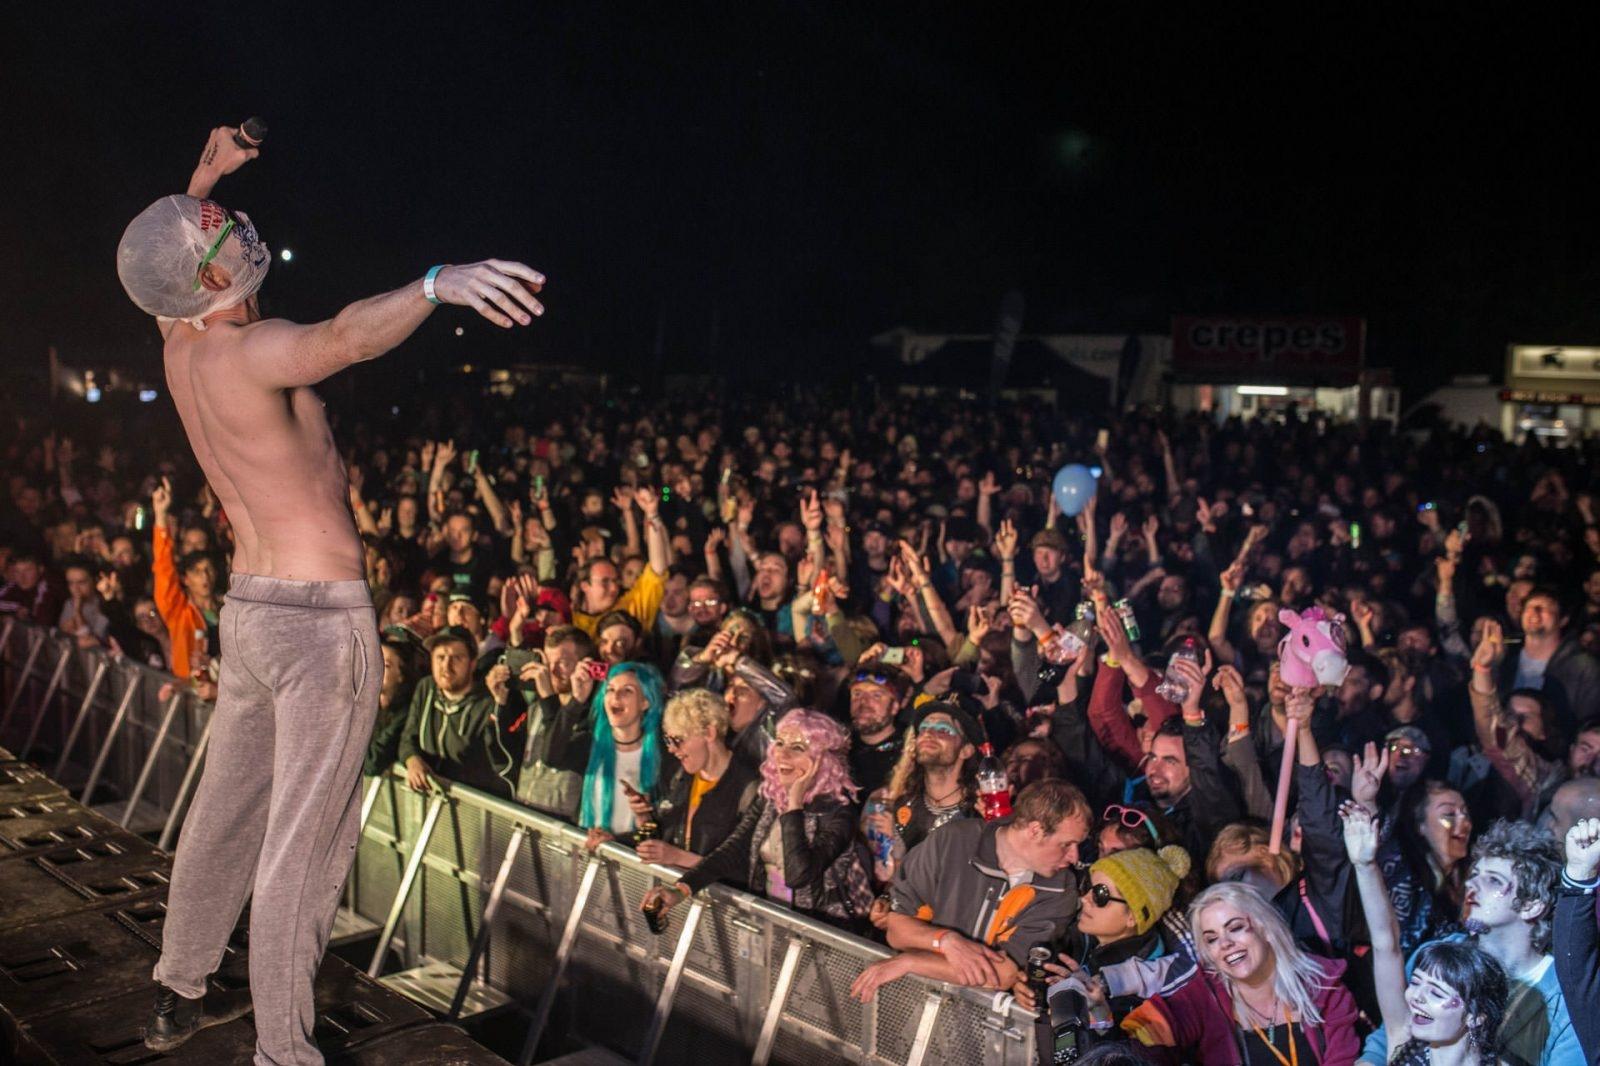 The Rubberbandits, Sunflowerfest 2017, Sunflowerfest 2018, Tubby's Farm, Hillsborough, CMcGuigan Photography, Chris McGuigan Photography, Festival